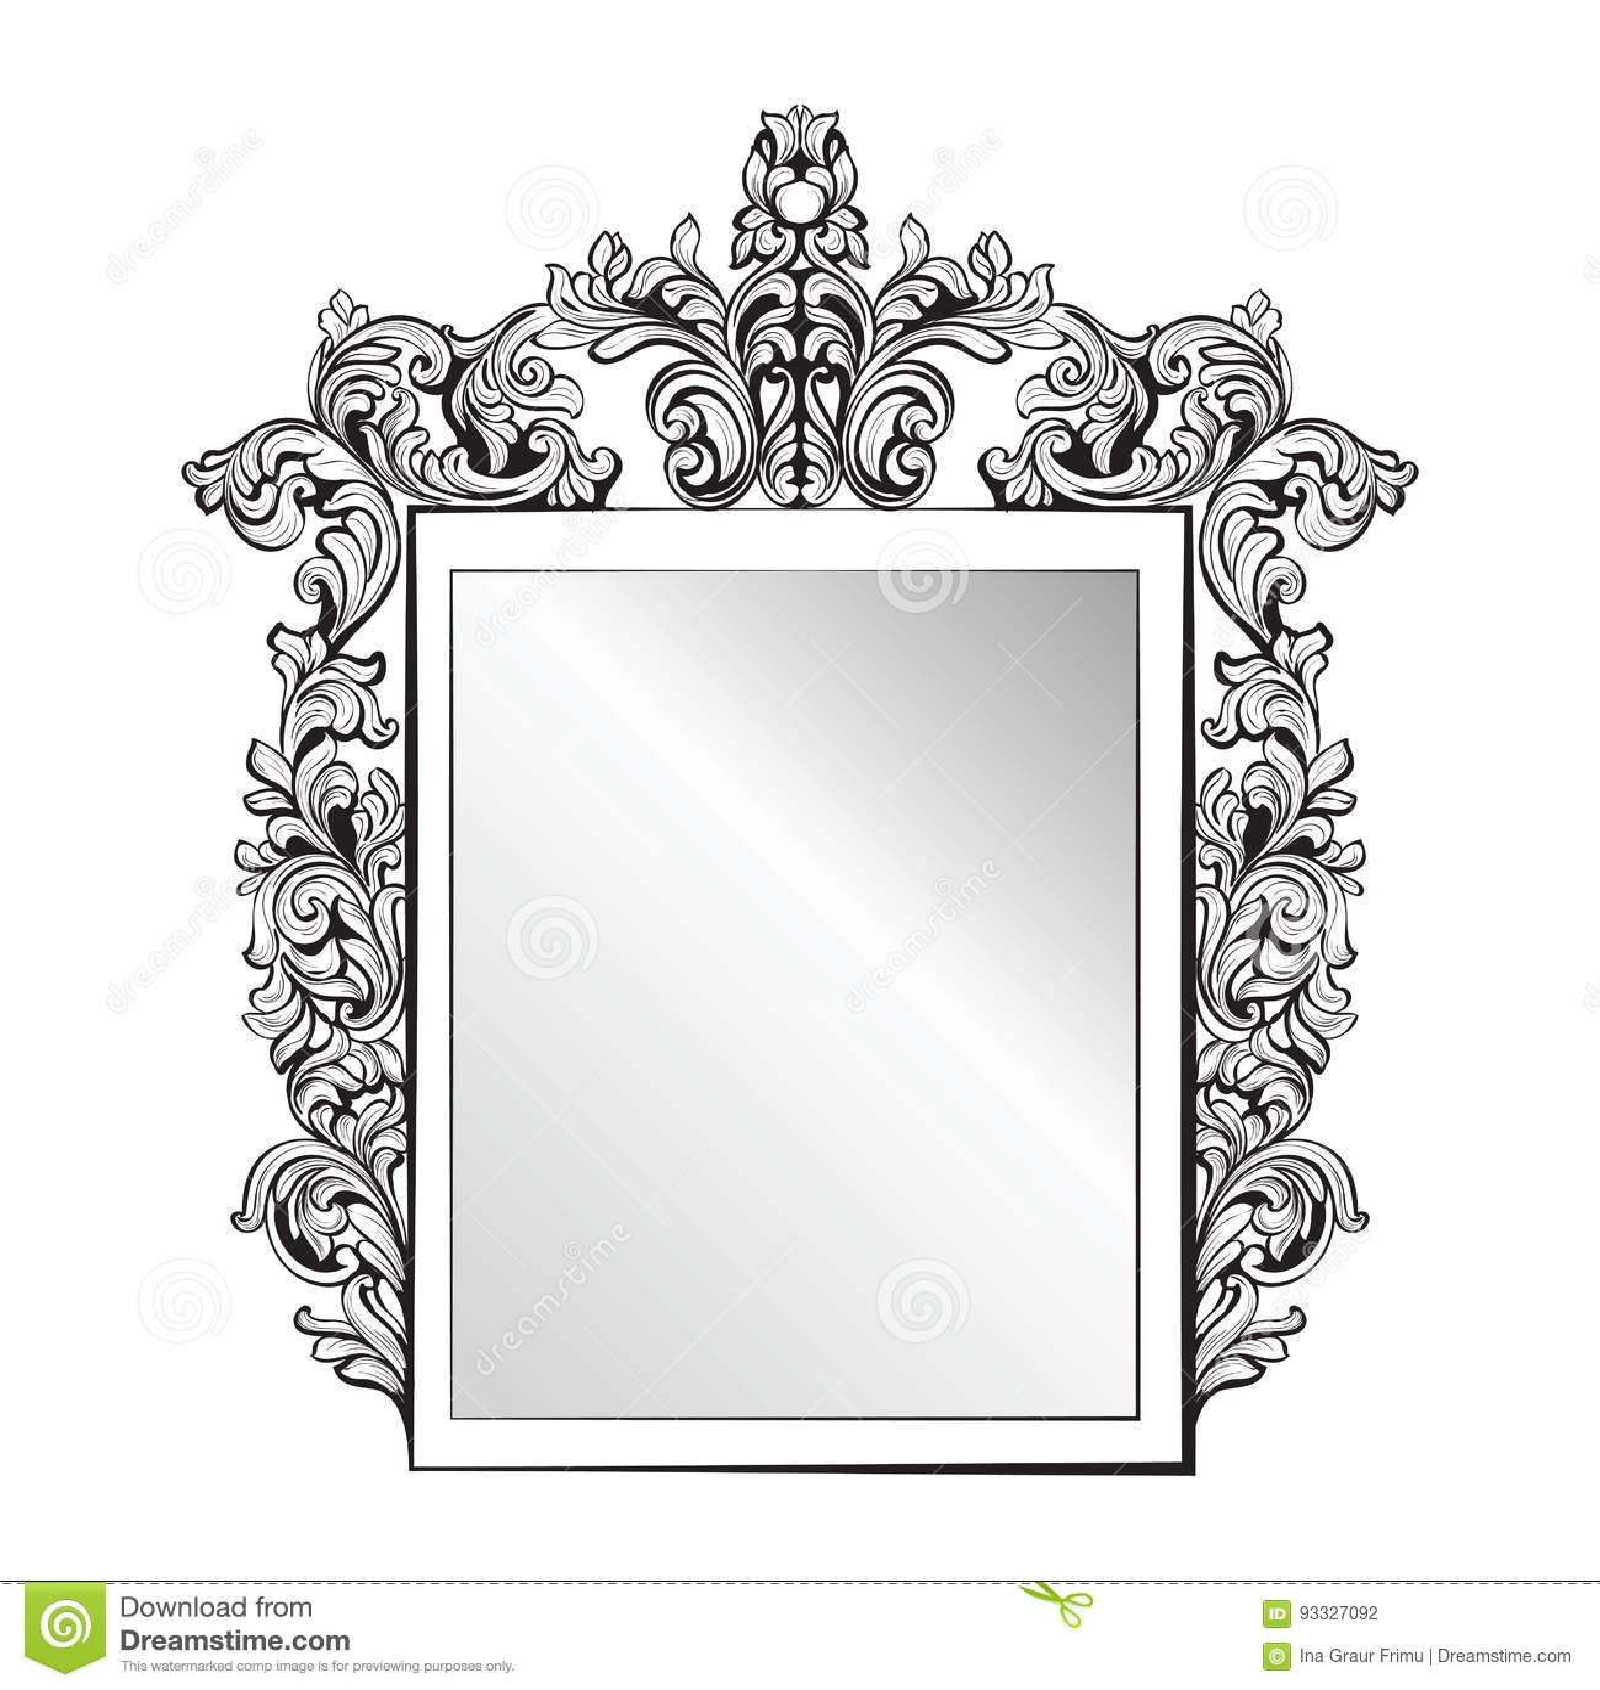 Wilko baroque mirror silver 87x62cm -  Imperial Baroque Mirror Frame Vector French Luxury Rich Intricate